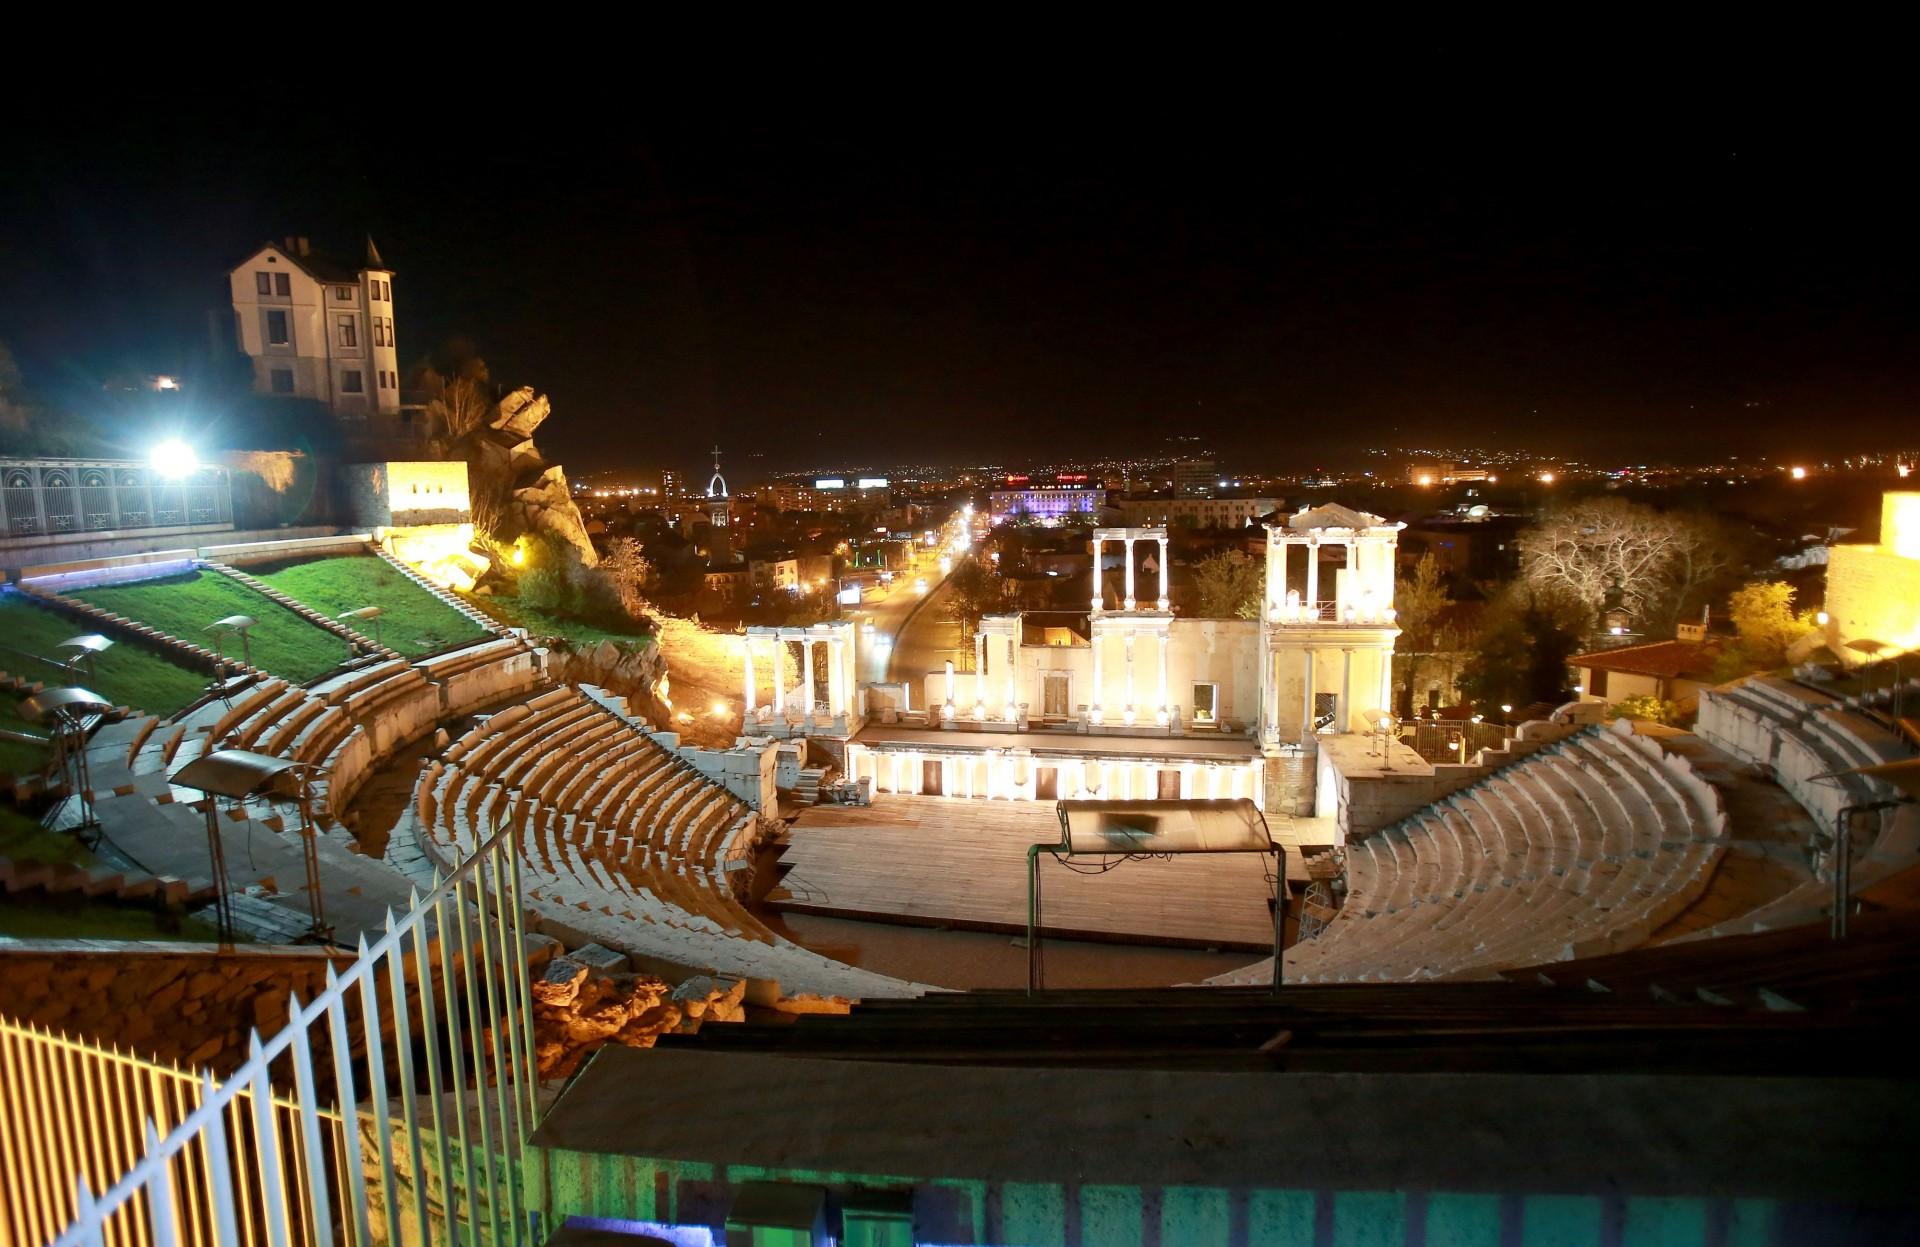 APRILE 2015 - PLOVDIV (BULGARIA). Il teatro romano (II sec. d. C.). Tony Vece. Ag Lara